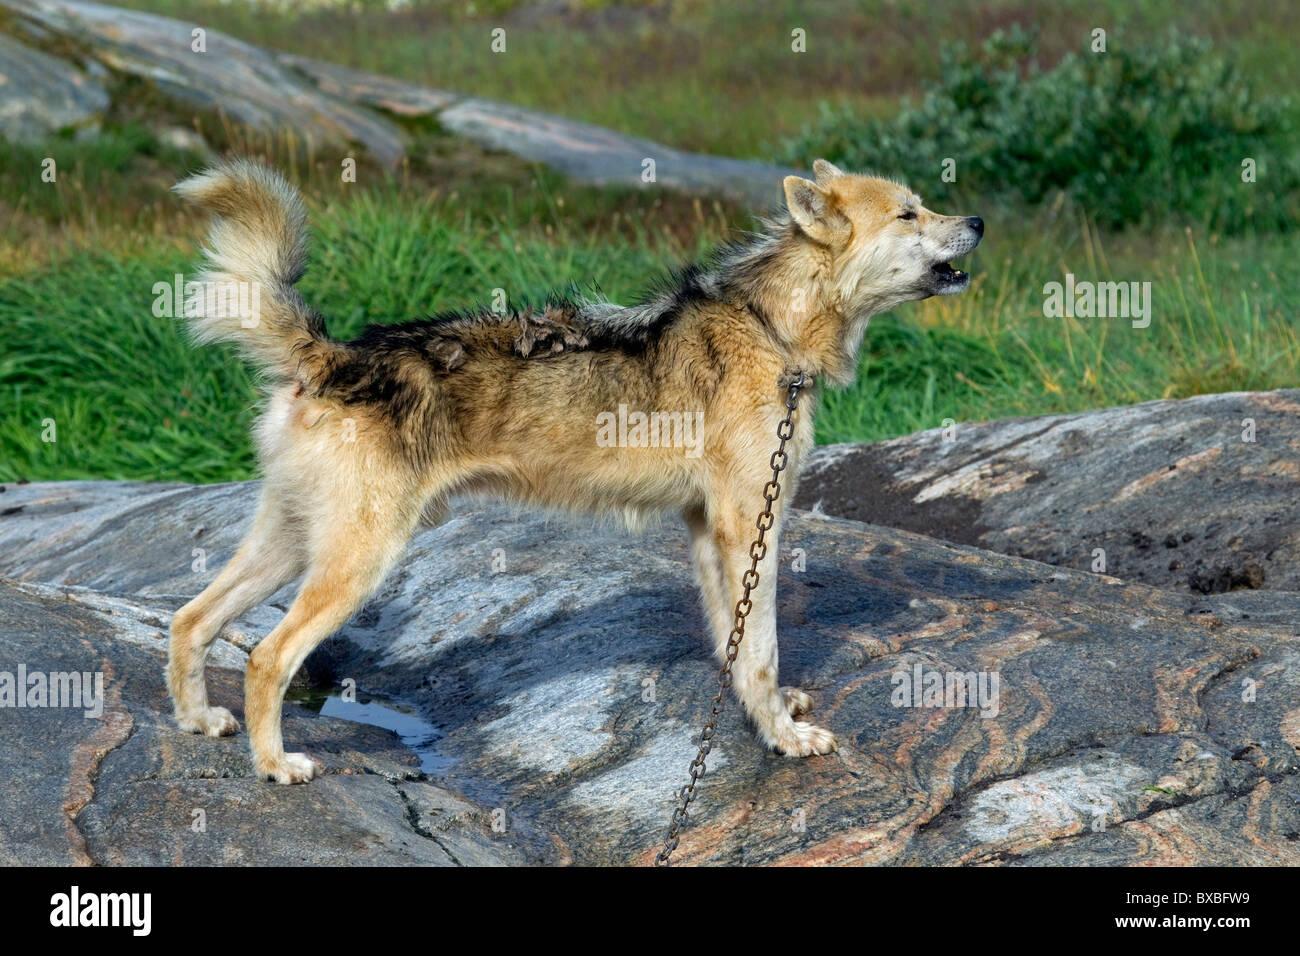 Greenland dog (Canis lupus familiaris), sledge dog howling, Ilulissat, West-Greenland, Greenland - Stock Image